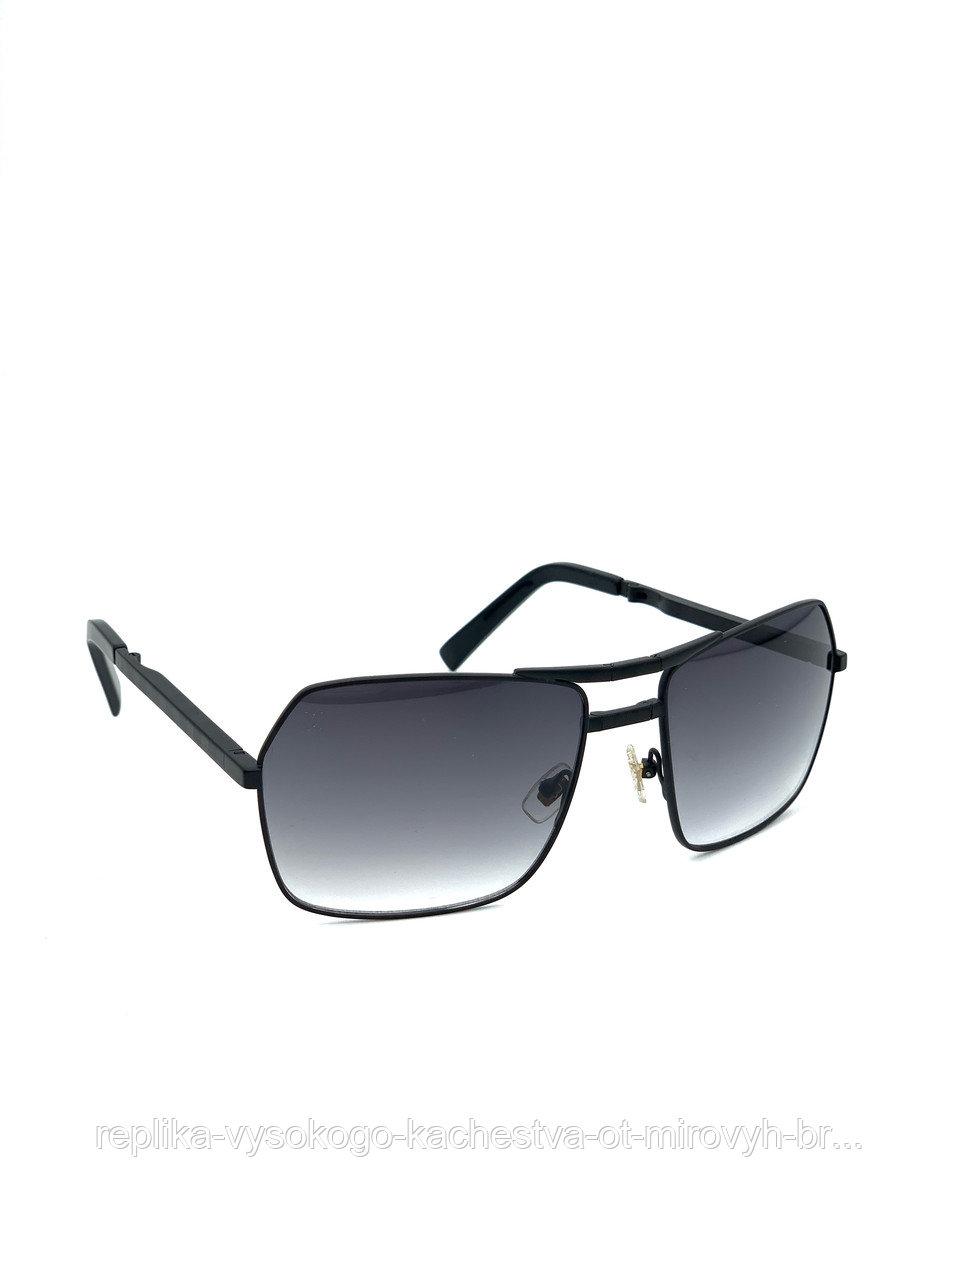 Очки Louis Vuitton ATTITUDE Black